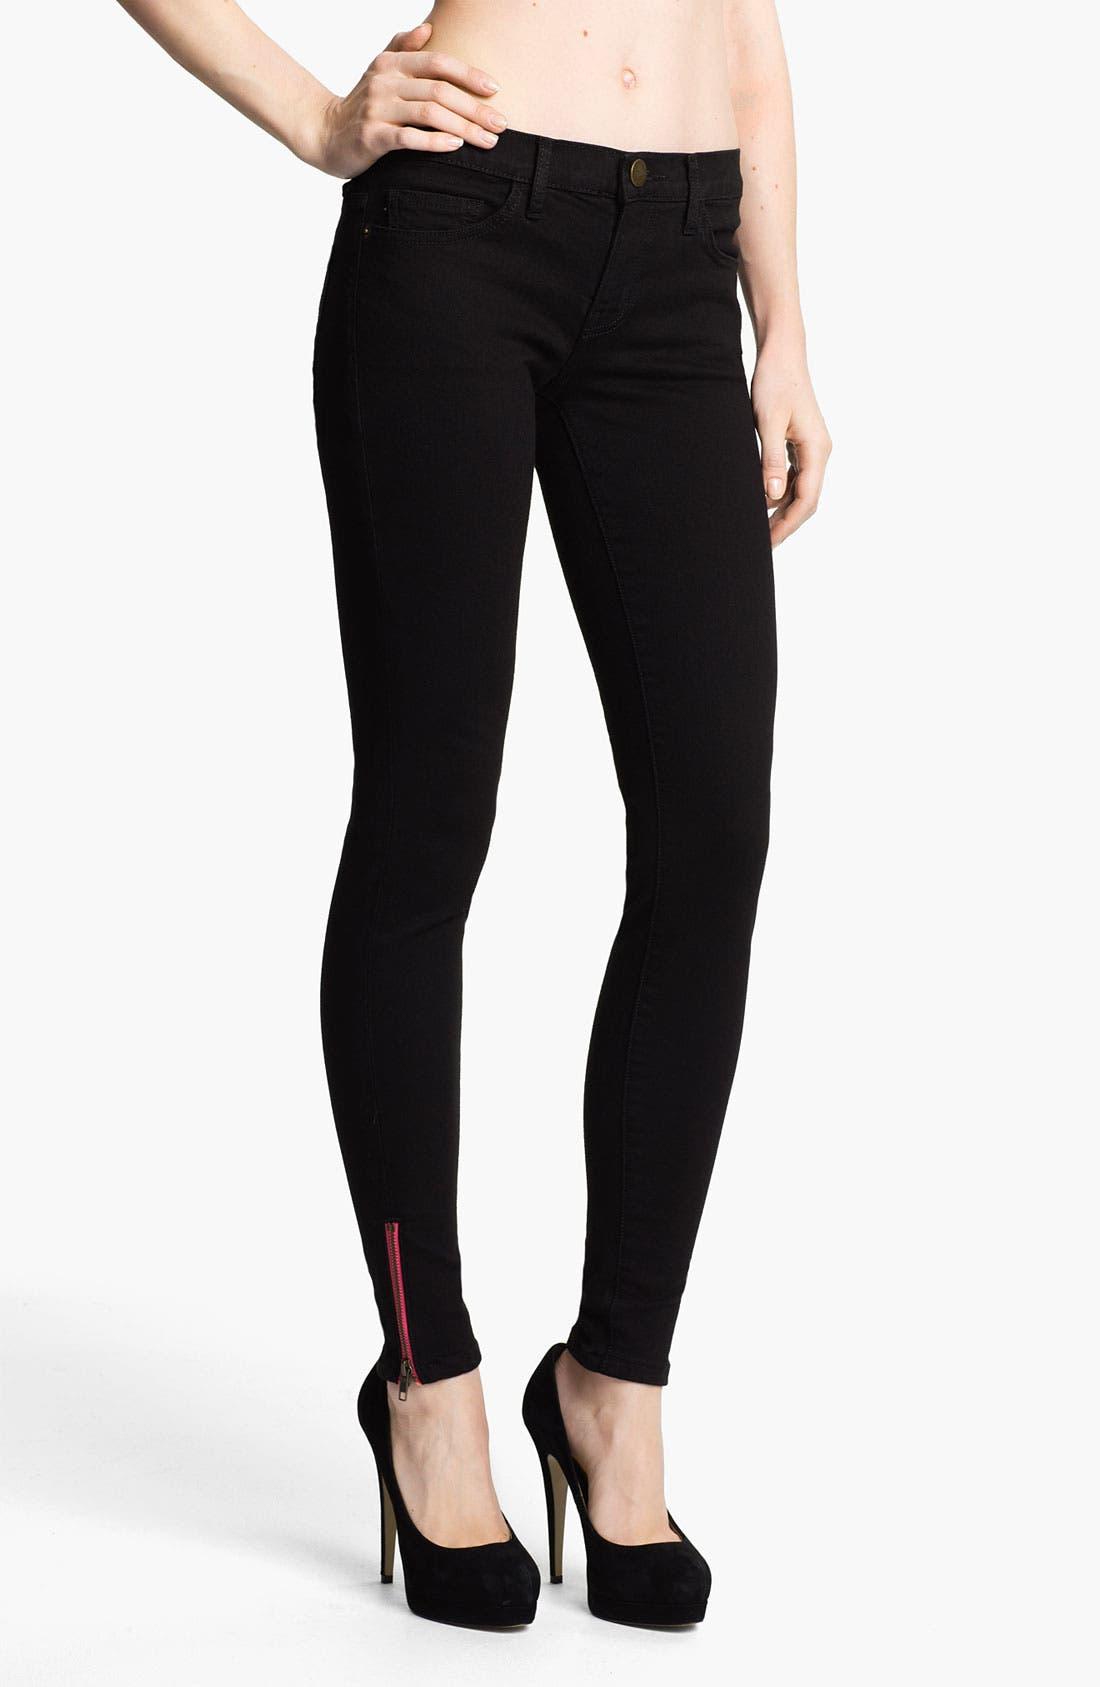 Alternate Image 1 Selected - Current/Elliott Skinny Stretch Ankle Jeans